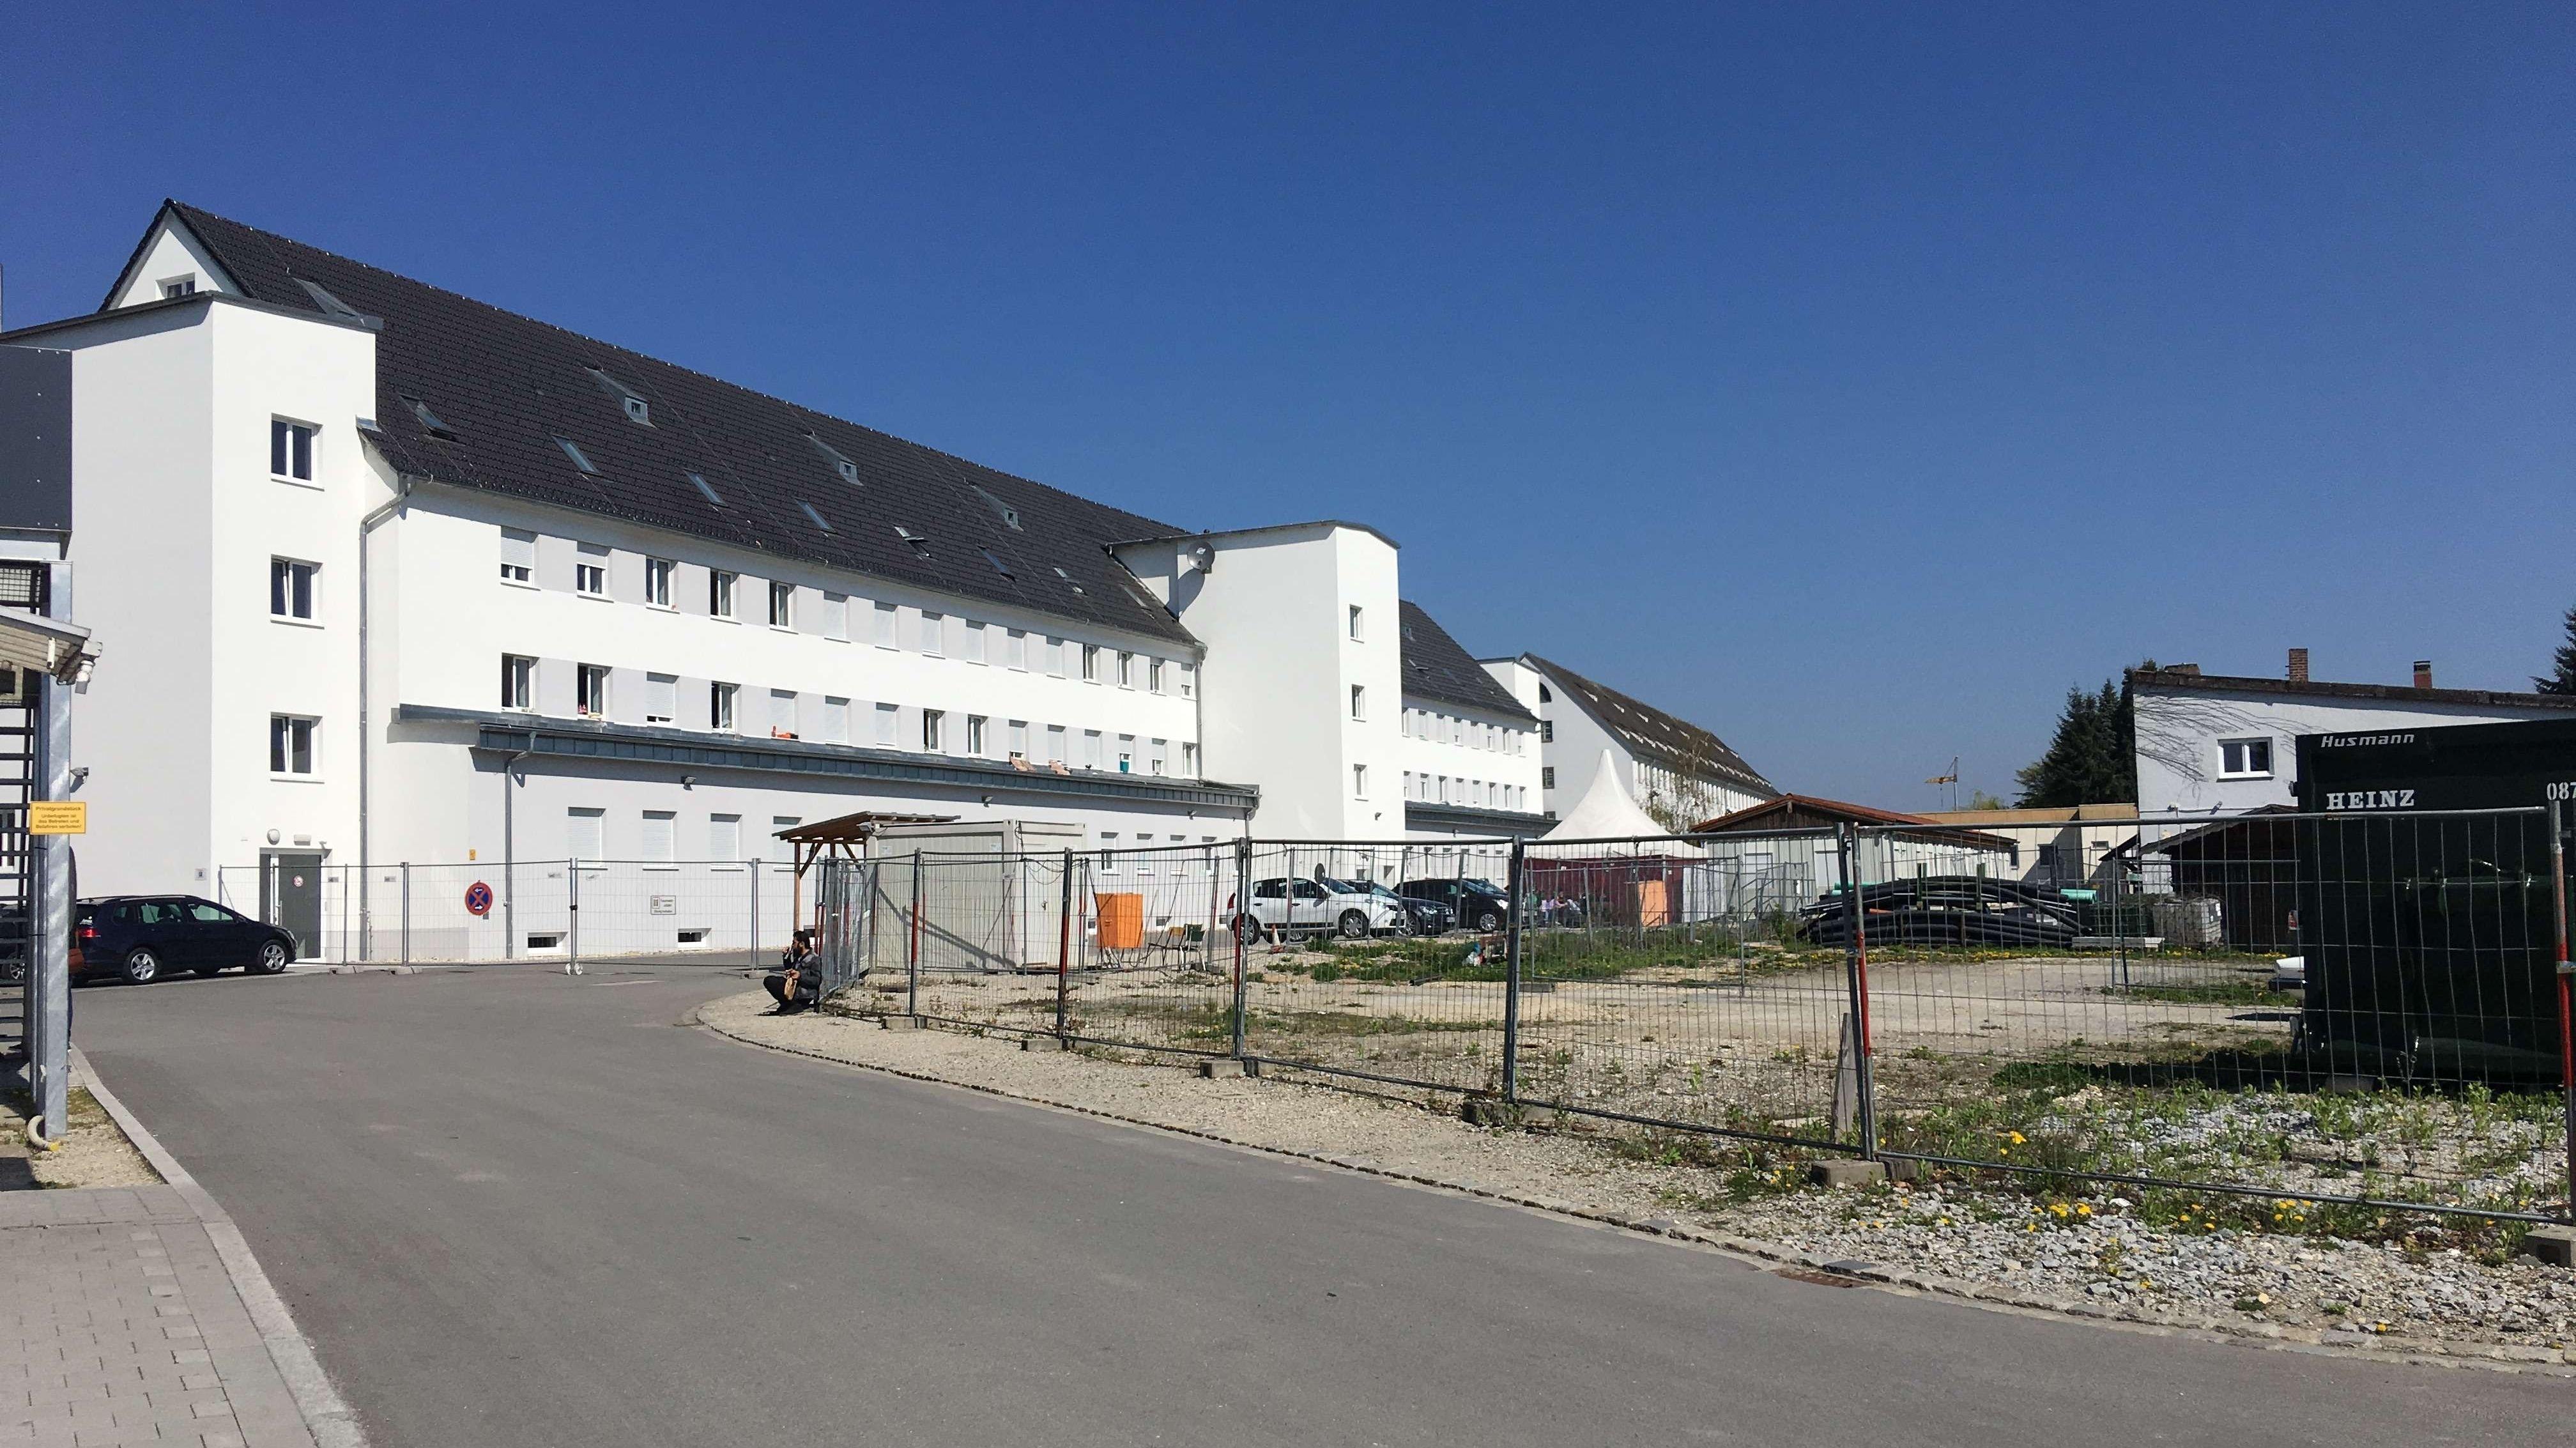 Ankerzentrum Deggendorf